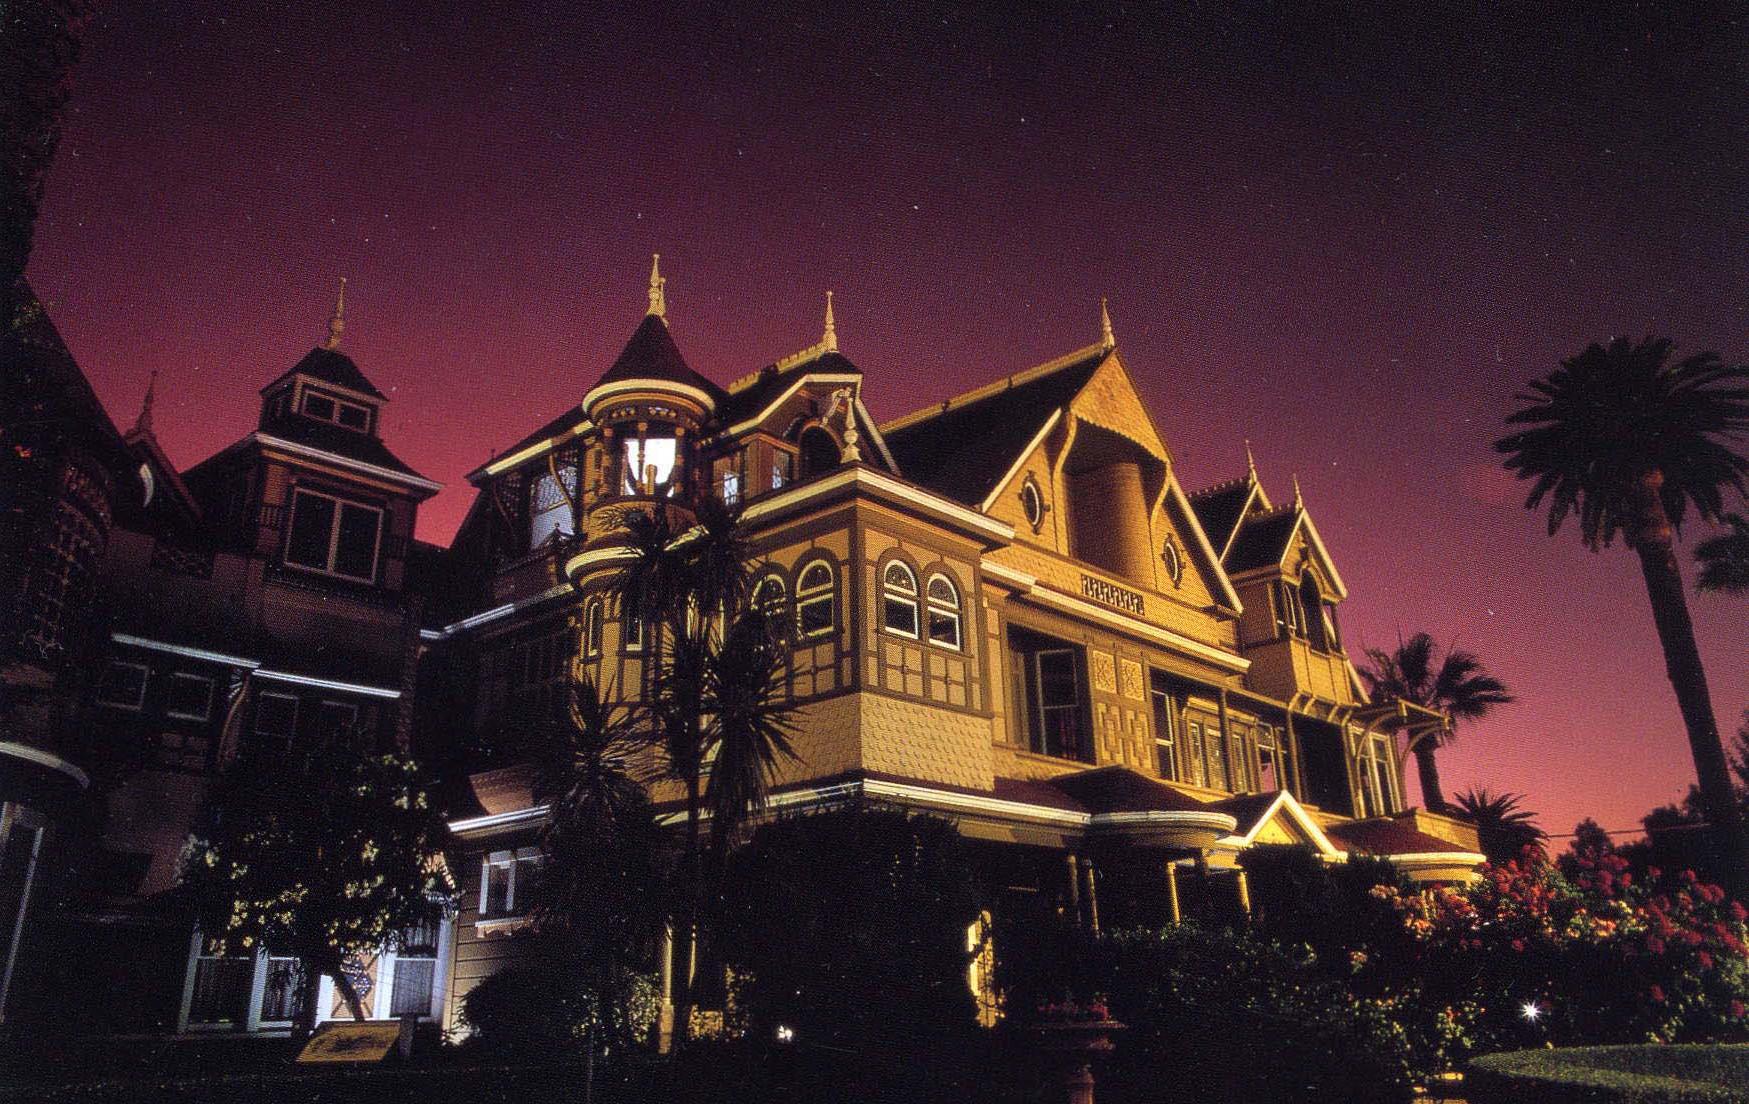 SanJose.com | Silicon Valley Halloween Events